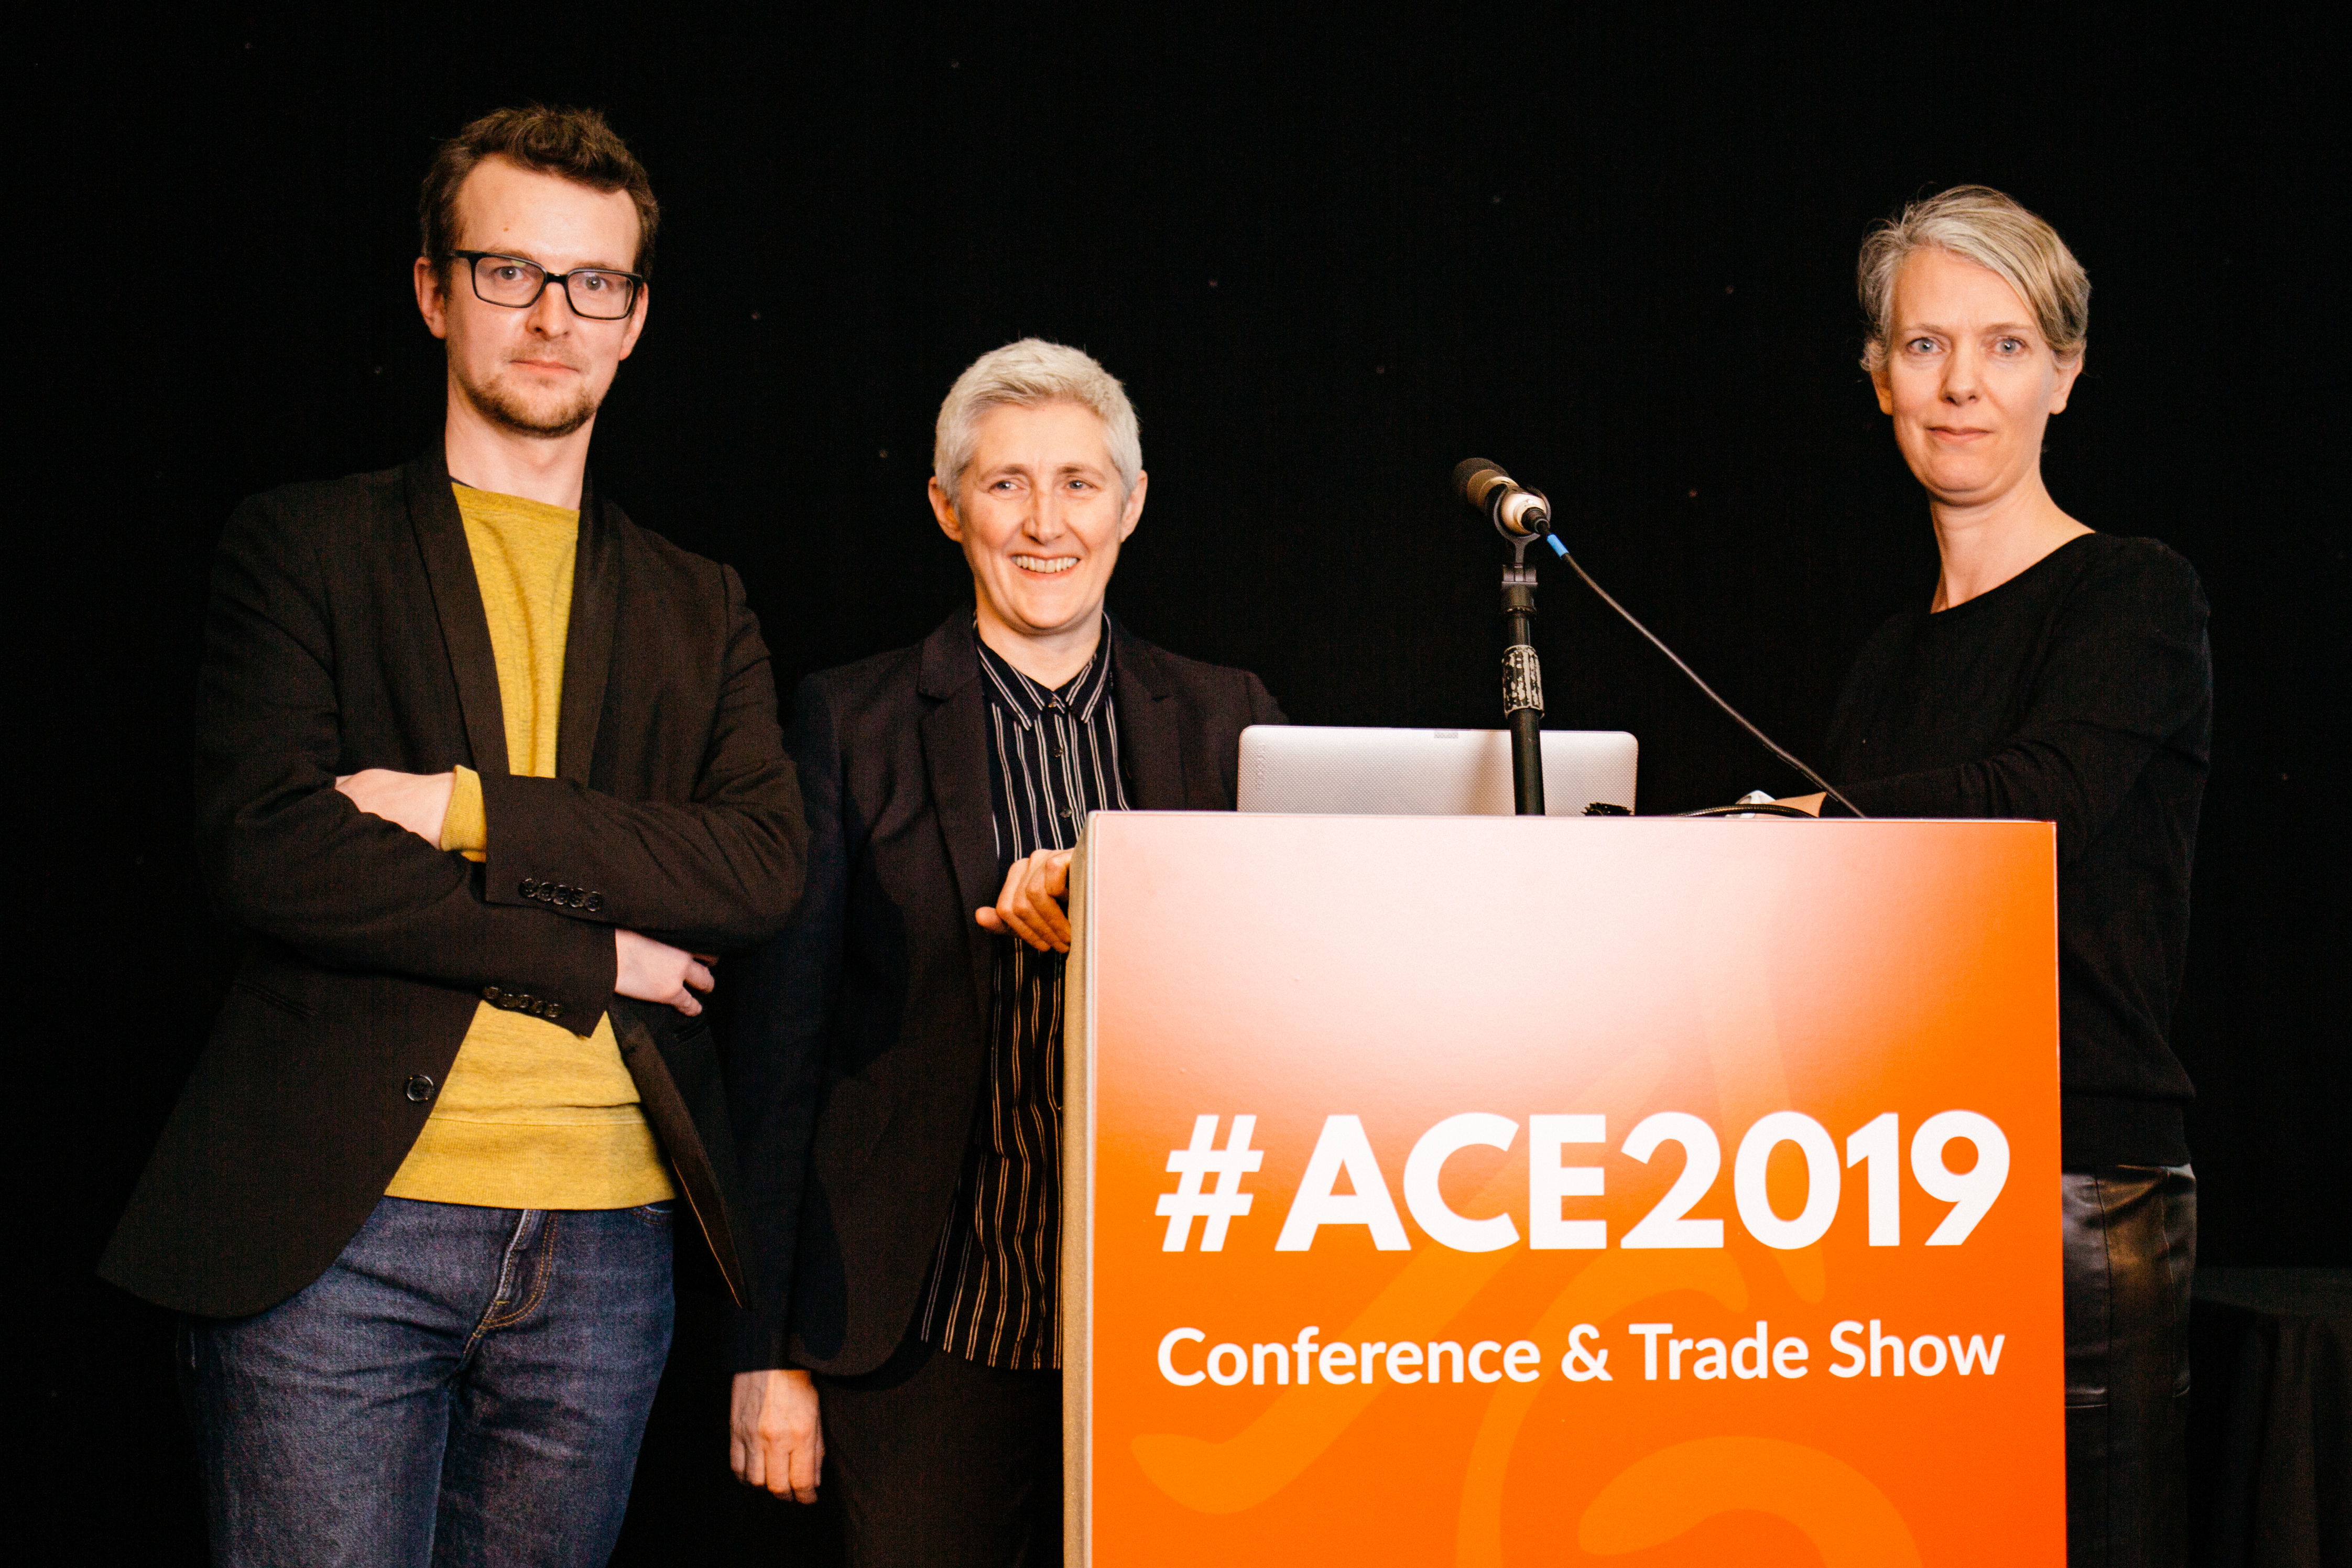 Frederic Jonckheere (ICOM Belgium Flanders), Caroline Brown (ACE Chairman en Head of Commercial Services, British Library) en Marieke van Bommel (directeur MAS) op de ACE conferentie.